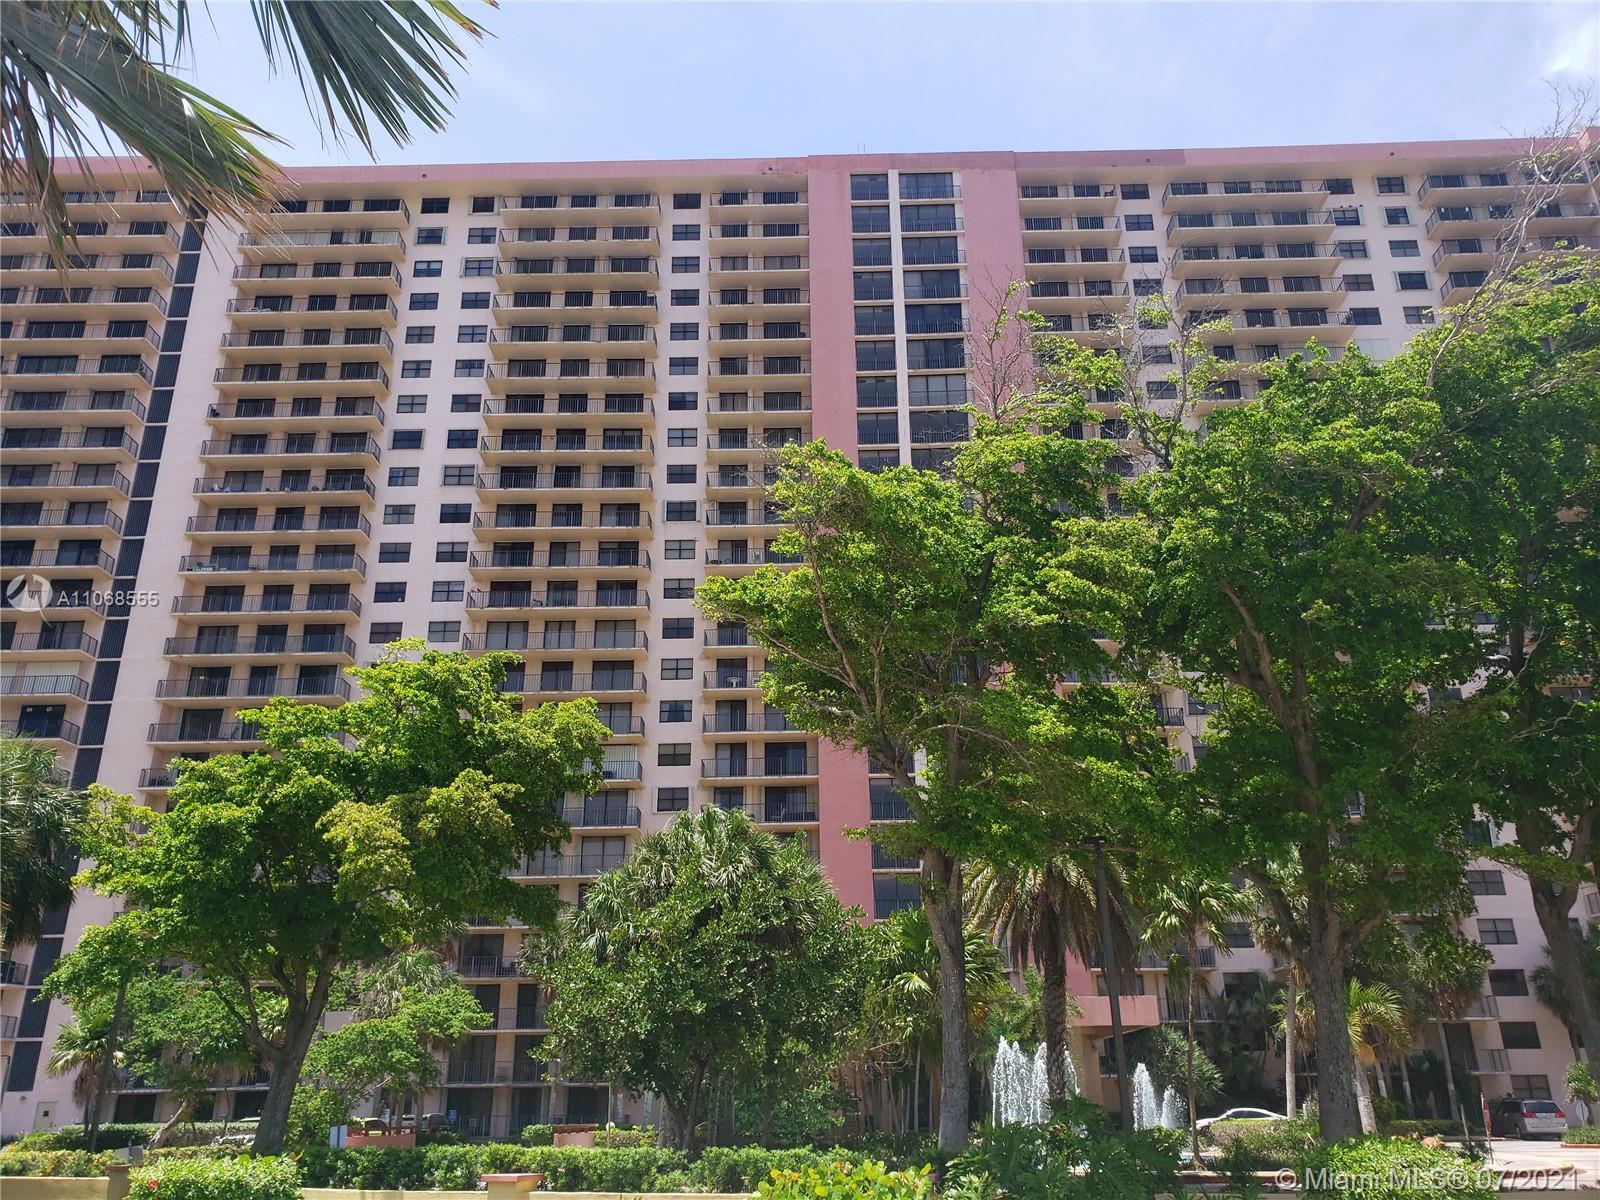 Winston Tower 600 #PH 2409 - 210 174th St #PH 2409, Sunny Isles Beach, FL 33160